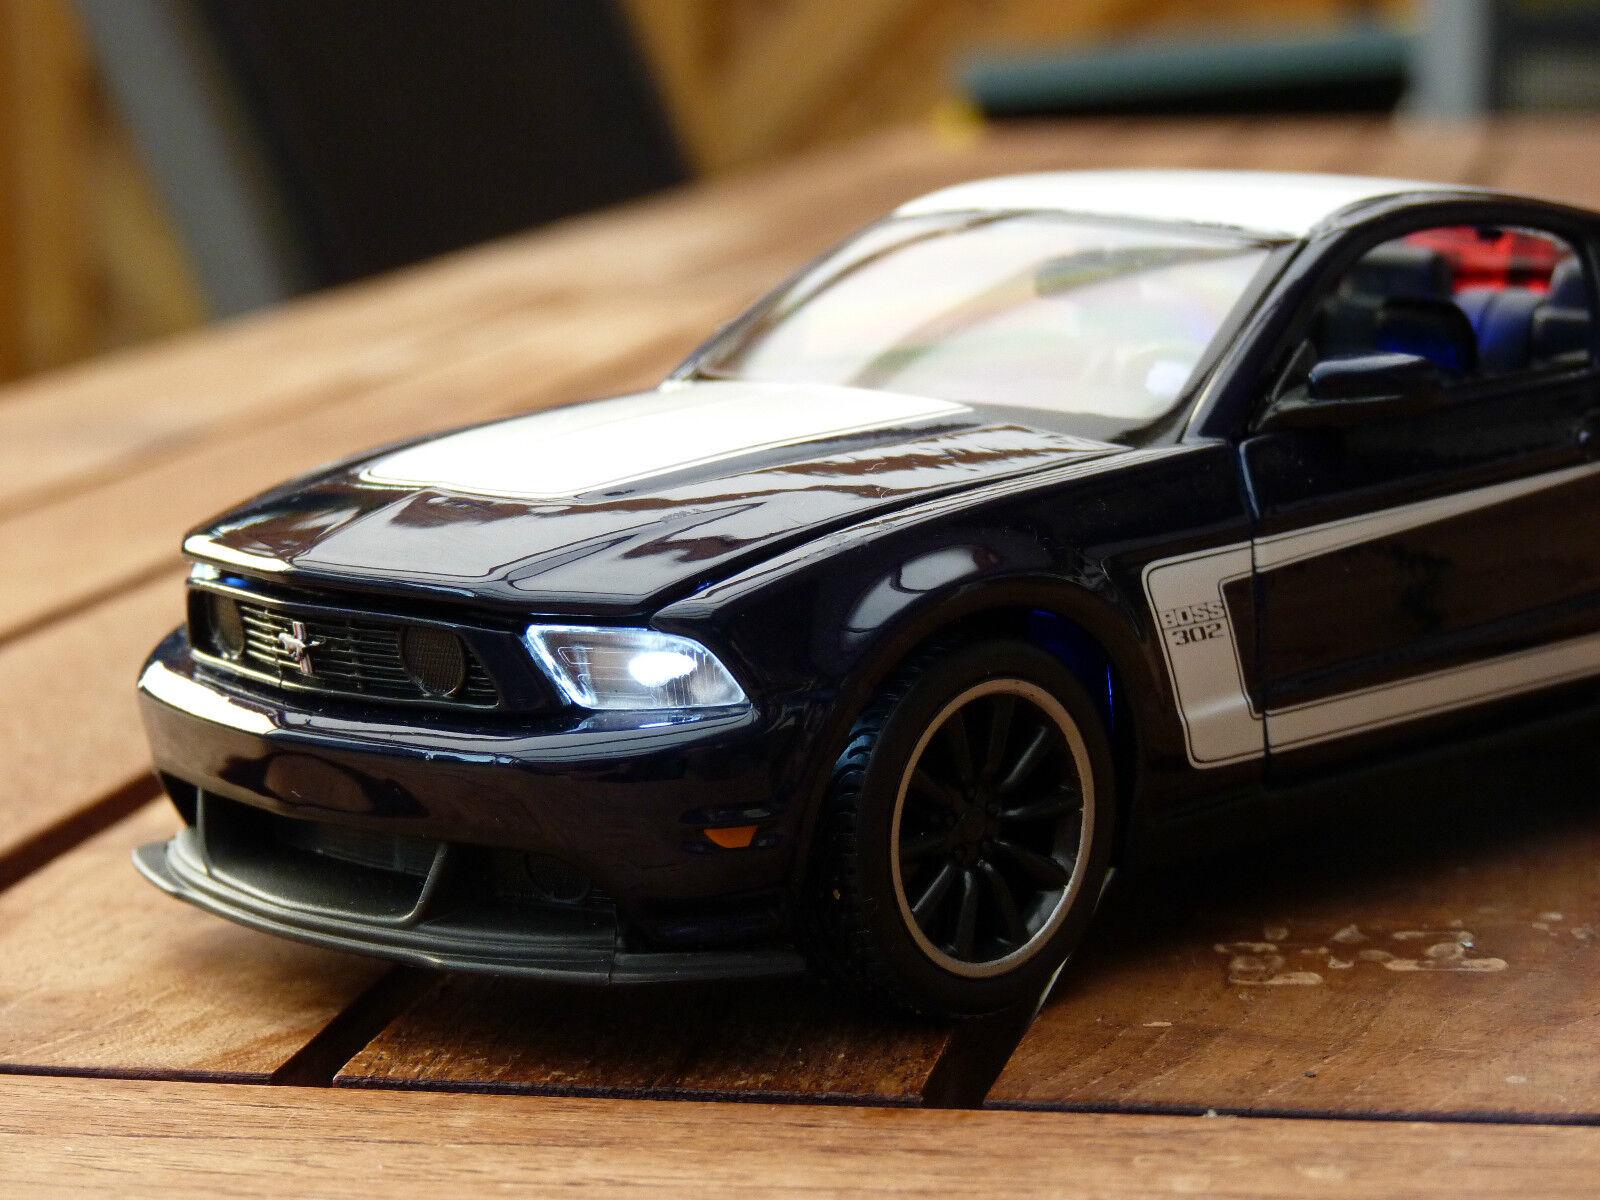 Ford Mustang Boss 302 1 24 avec DEL-éclairage (Xénon) Maisto